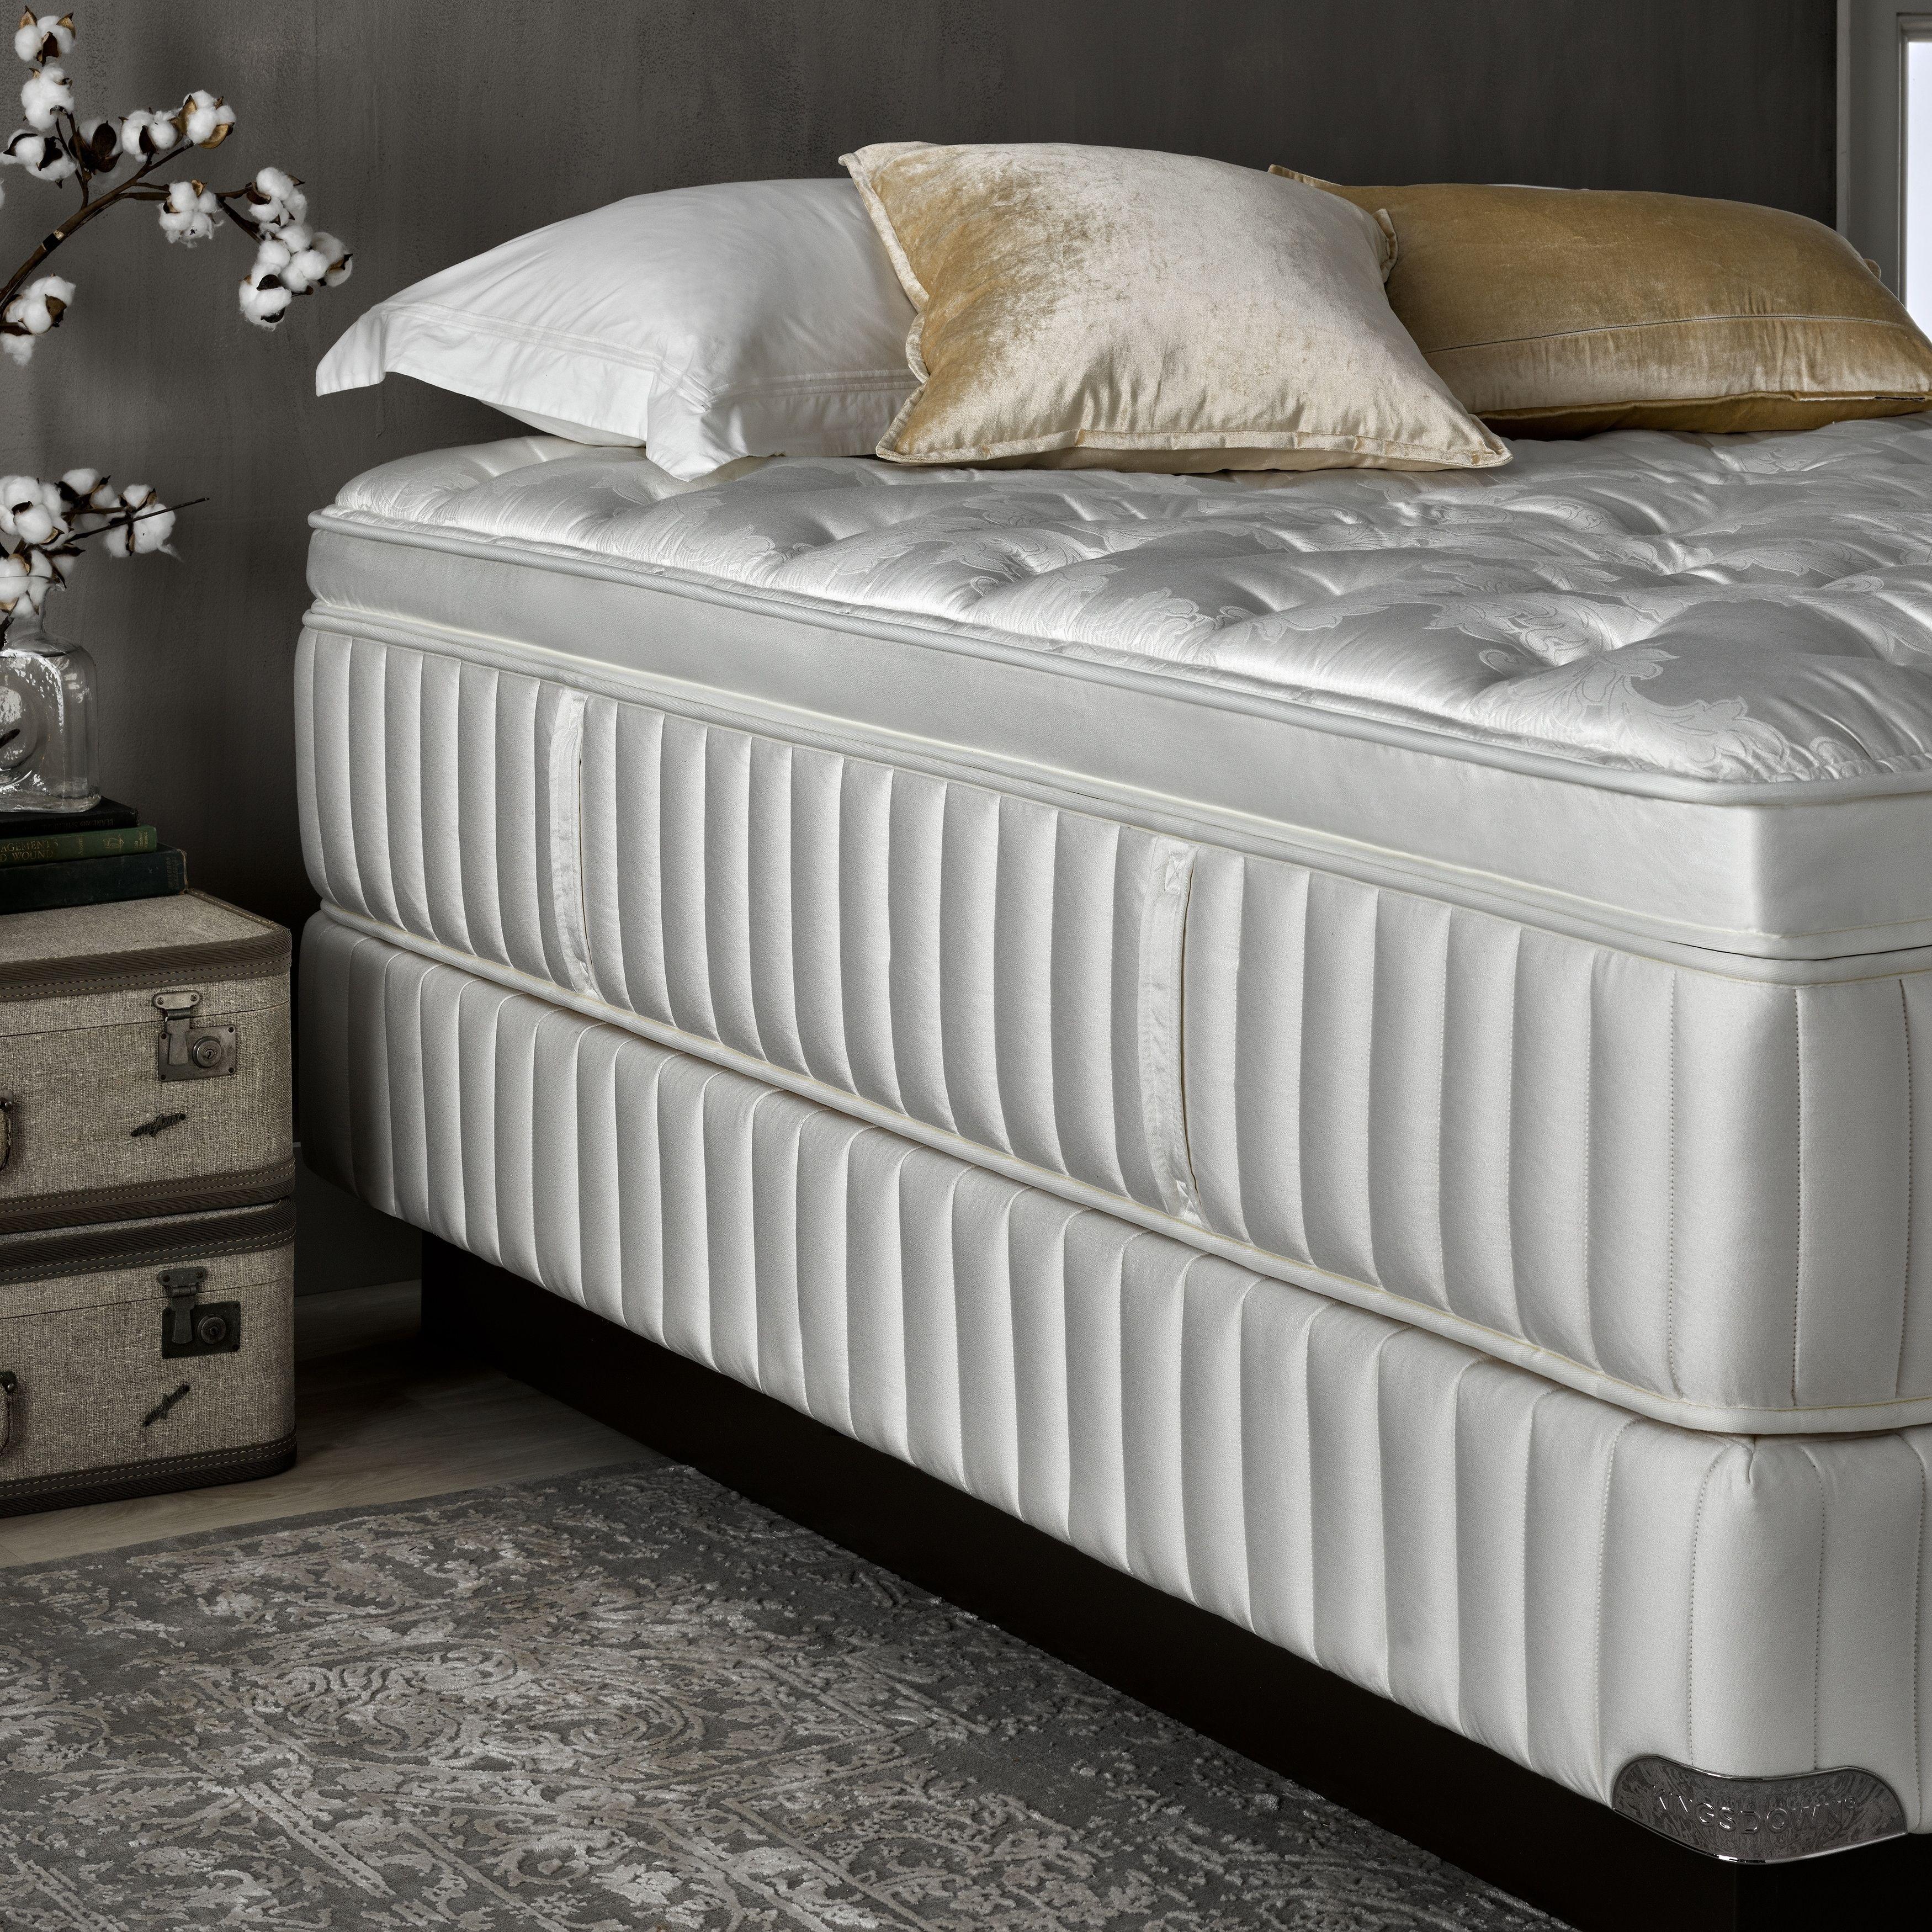 Kingsdown Vintage Home Furnishings Furnishings Sleep Solutions